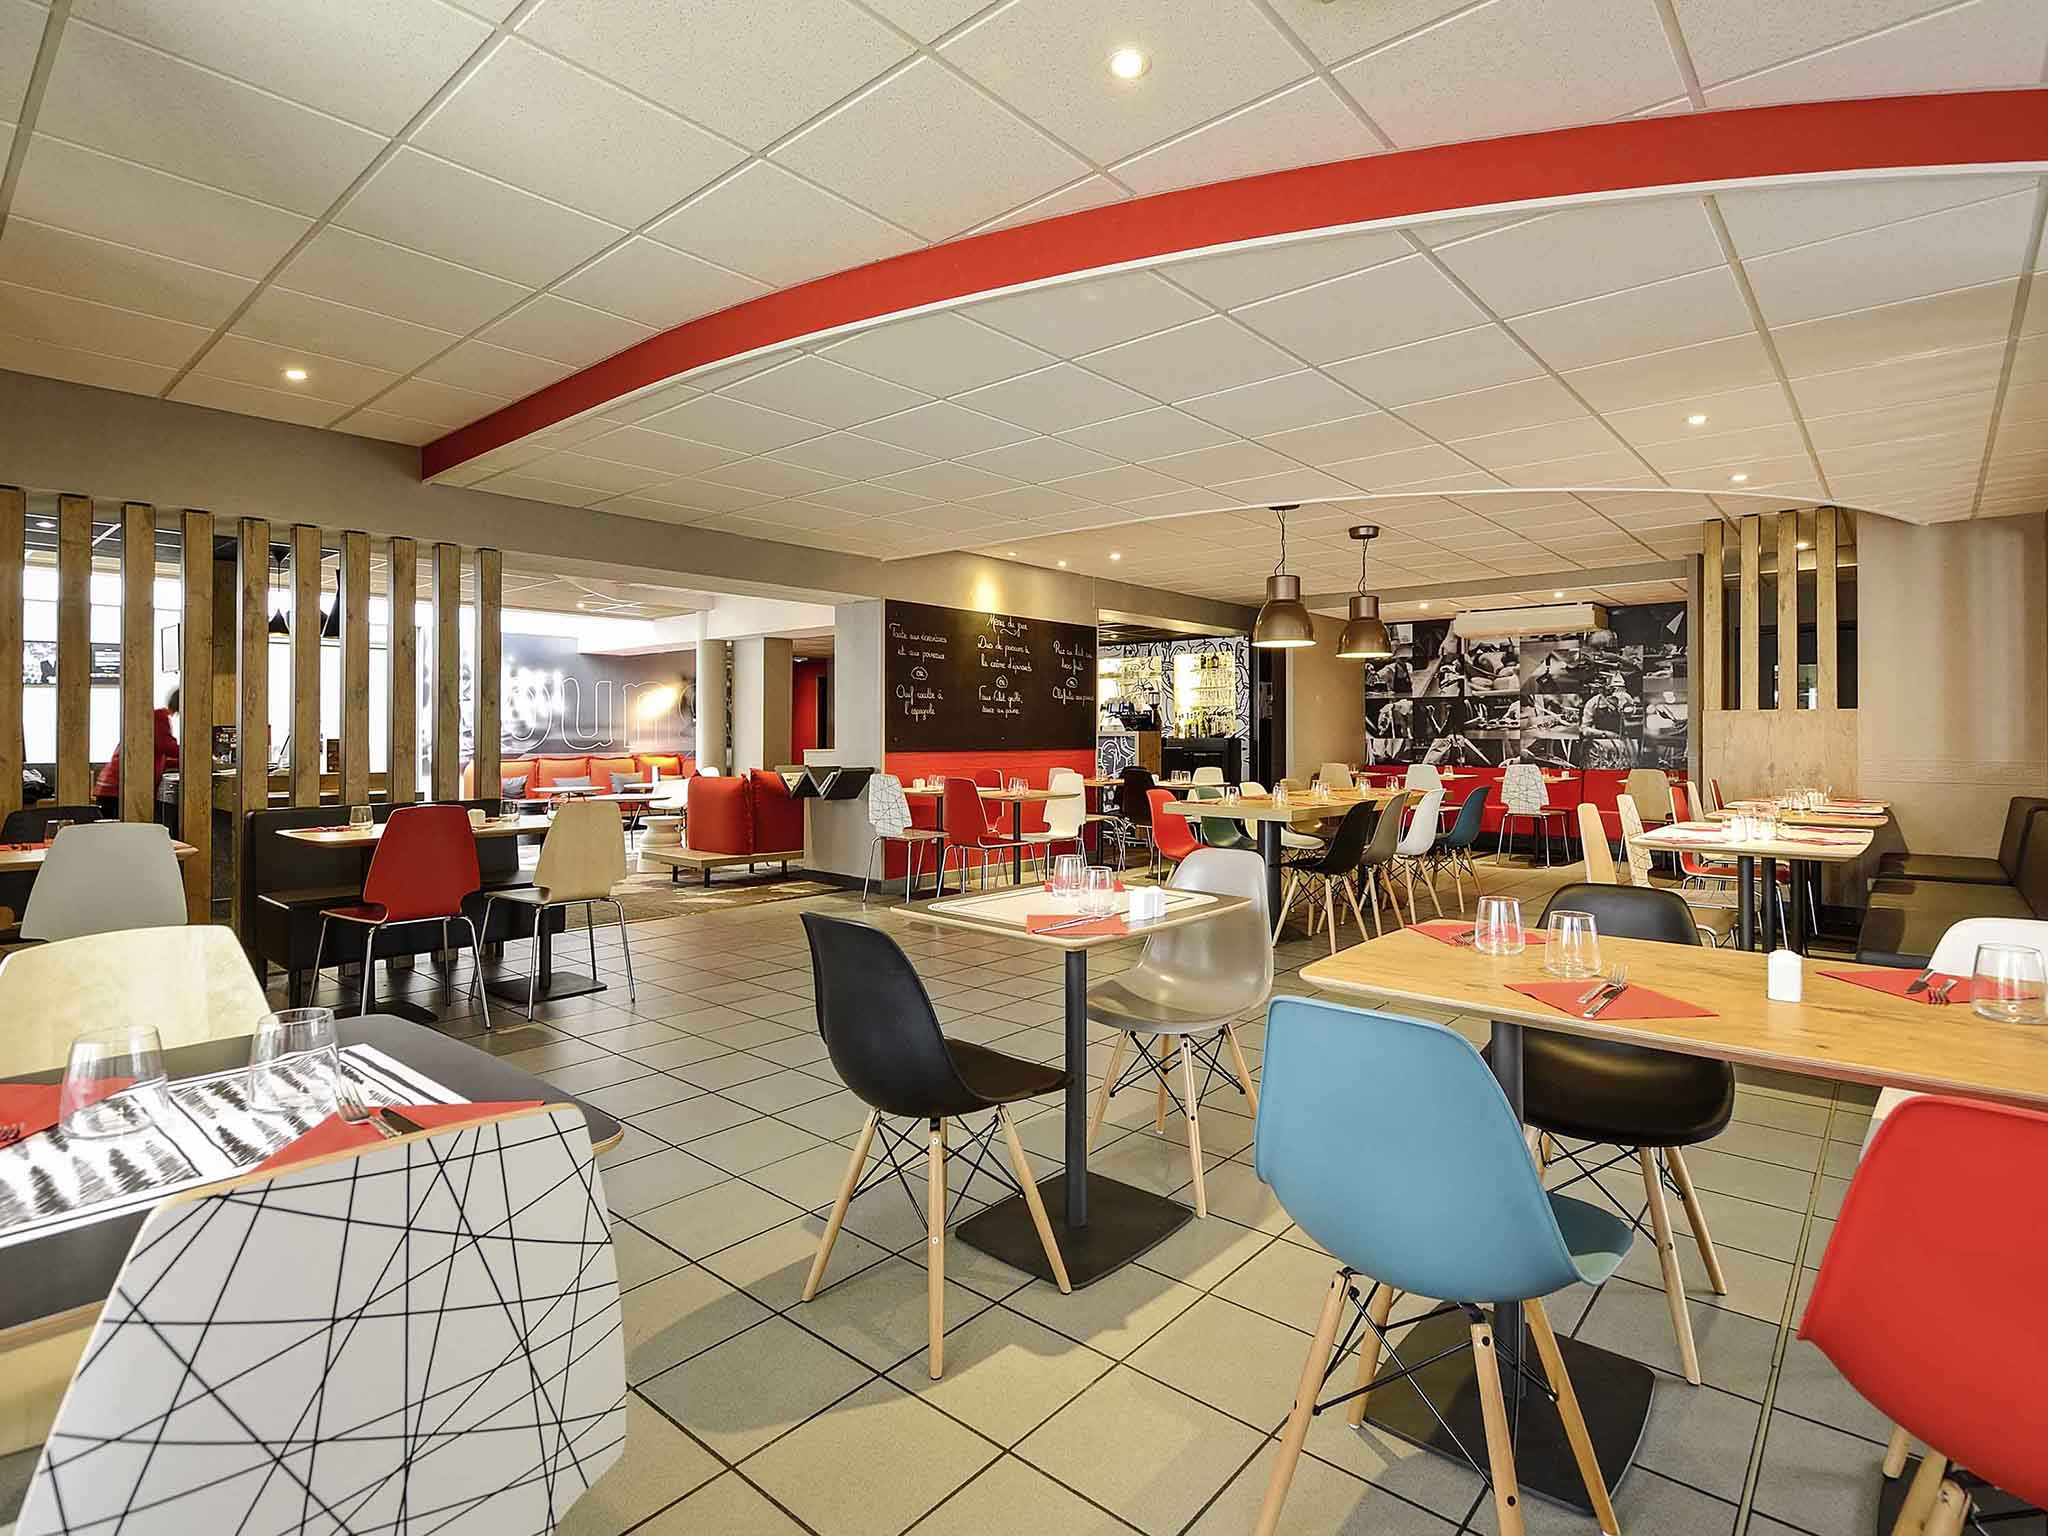 Cafeteria casino poitiers futuroscope slots casino app cheats